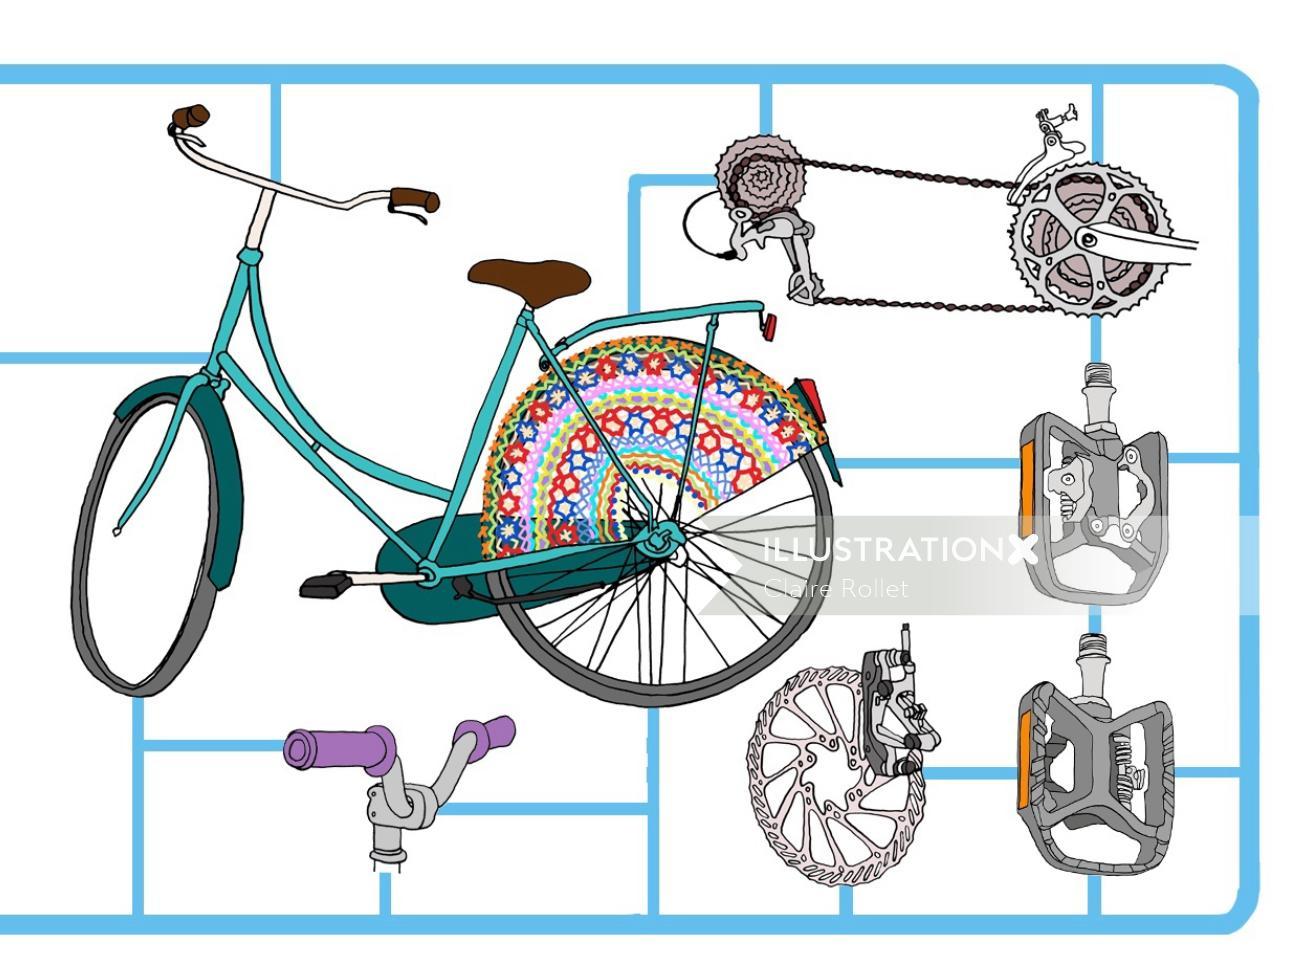 'Fix your bike' book illustration